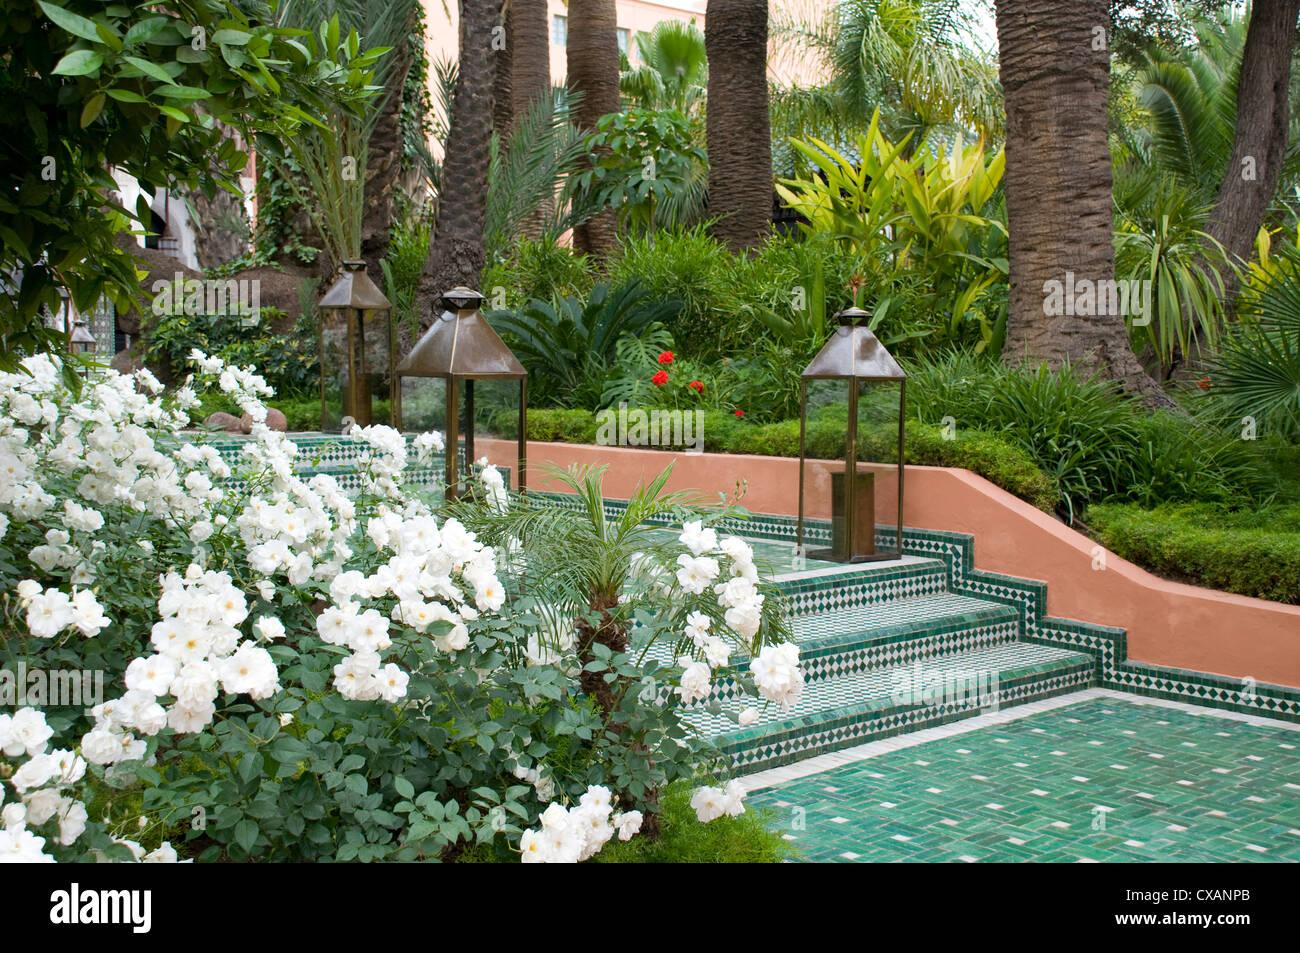 white roses stockfotos white roses bilder alamy. Black Bedroom Furniture Sets. Home Design Ideas